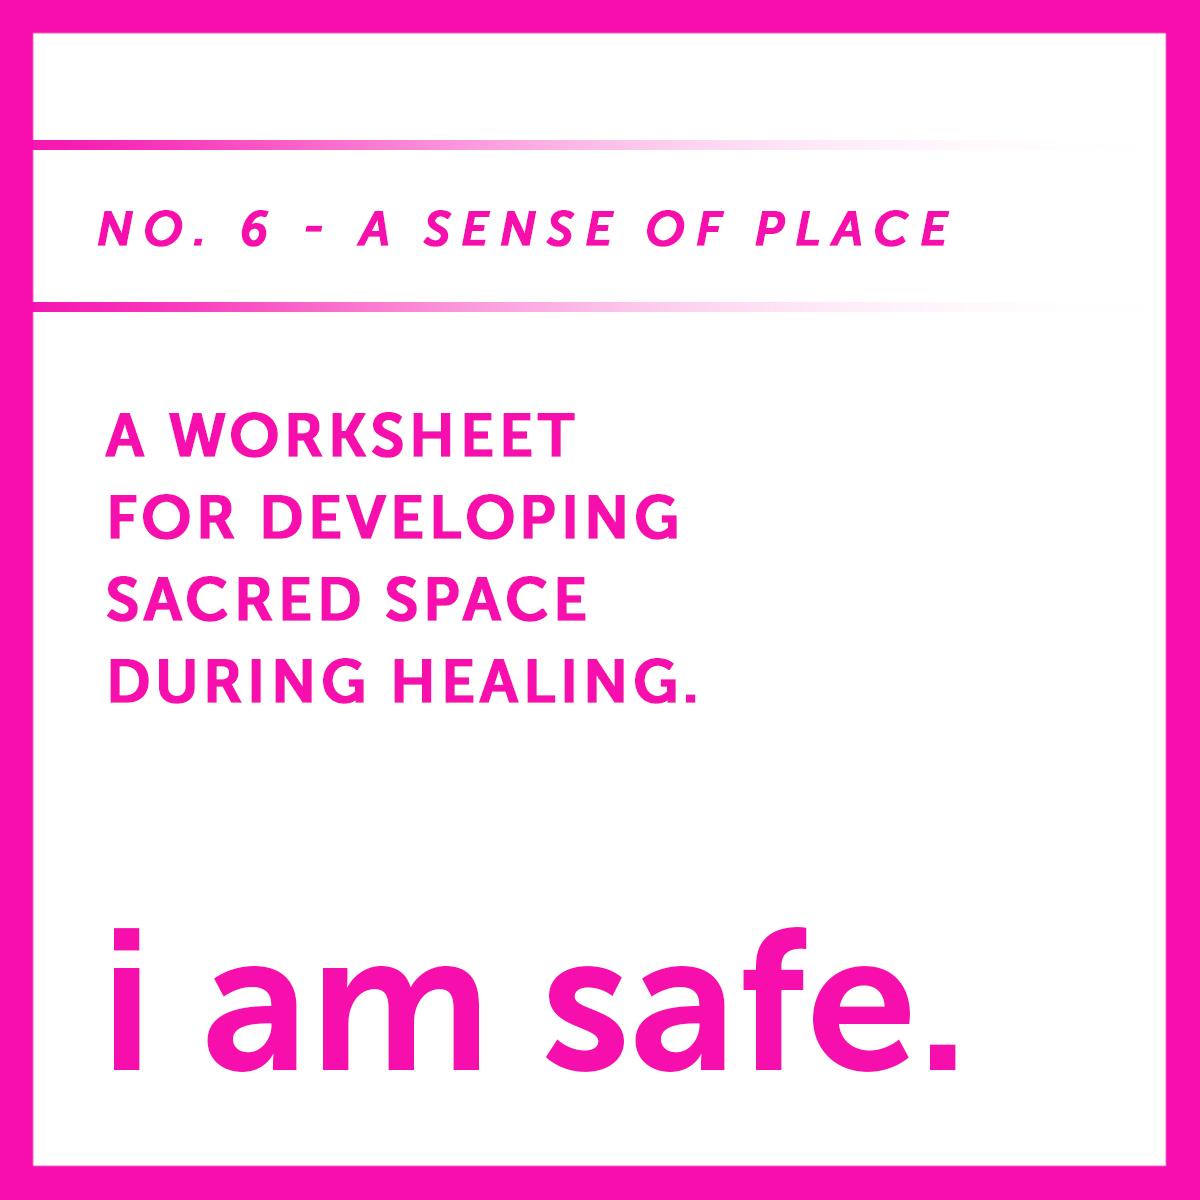 I AM SAFE six a sense of place.jpg